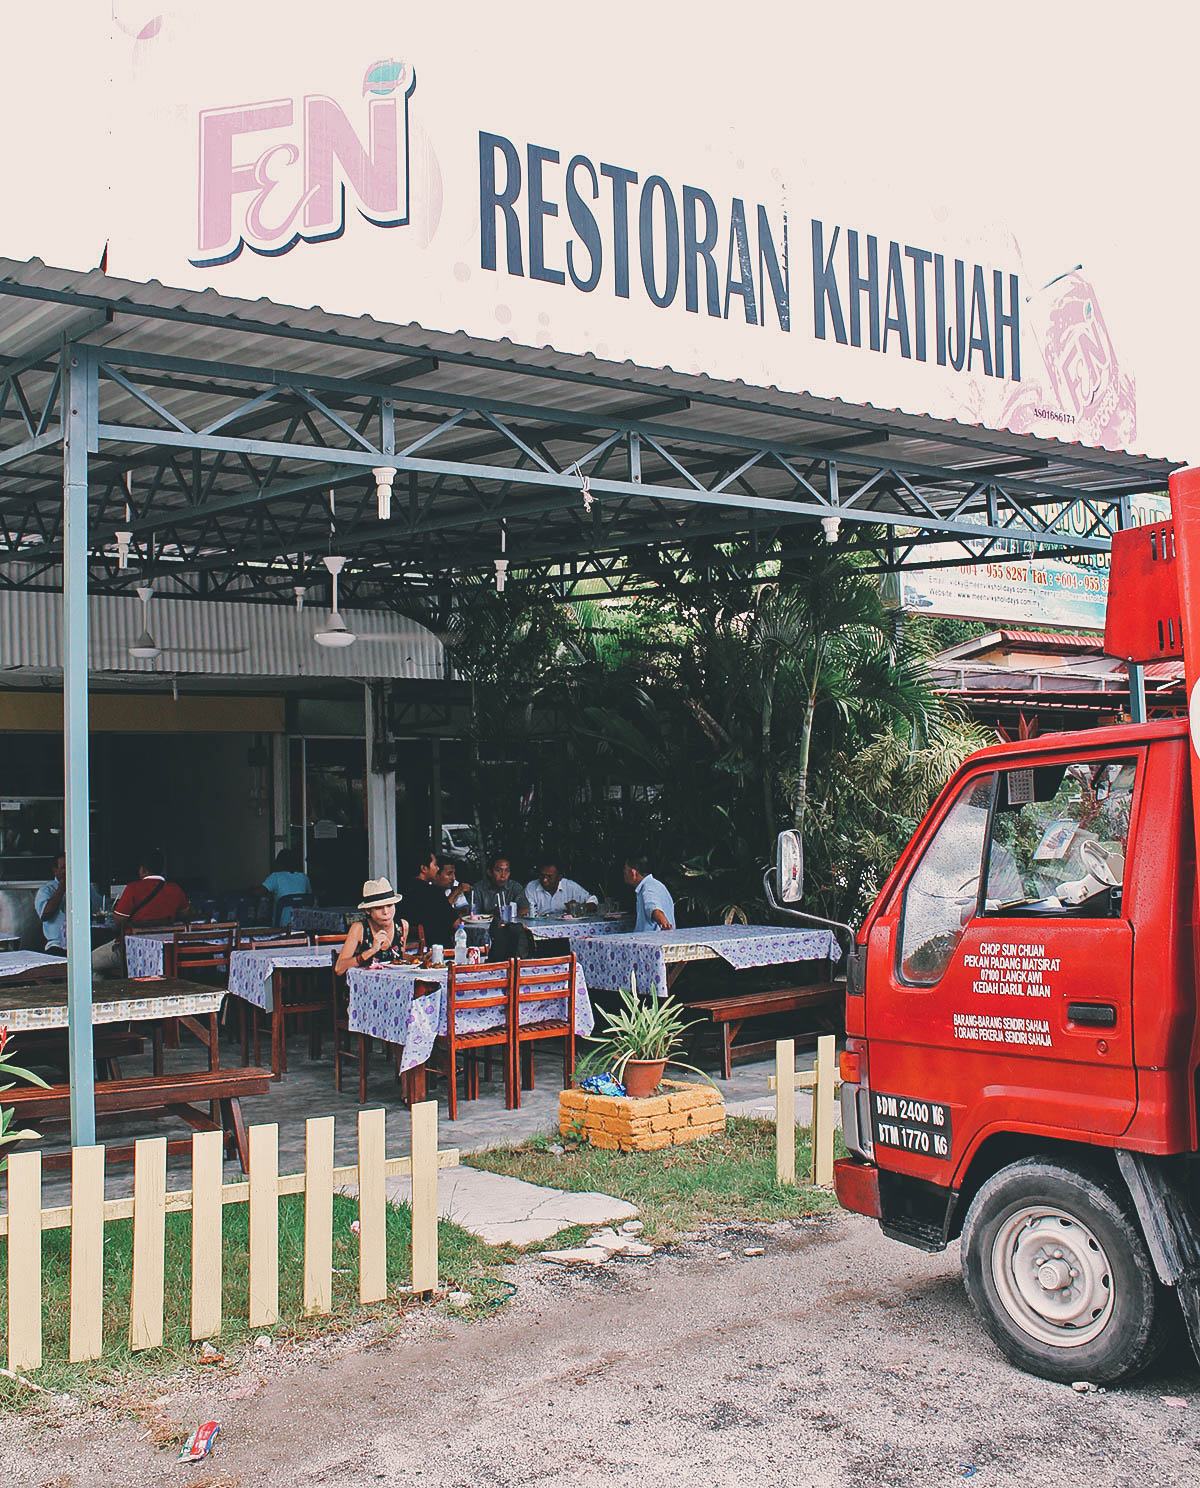 Restoran Khatijah